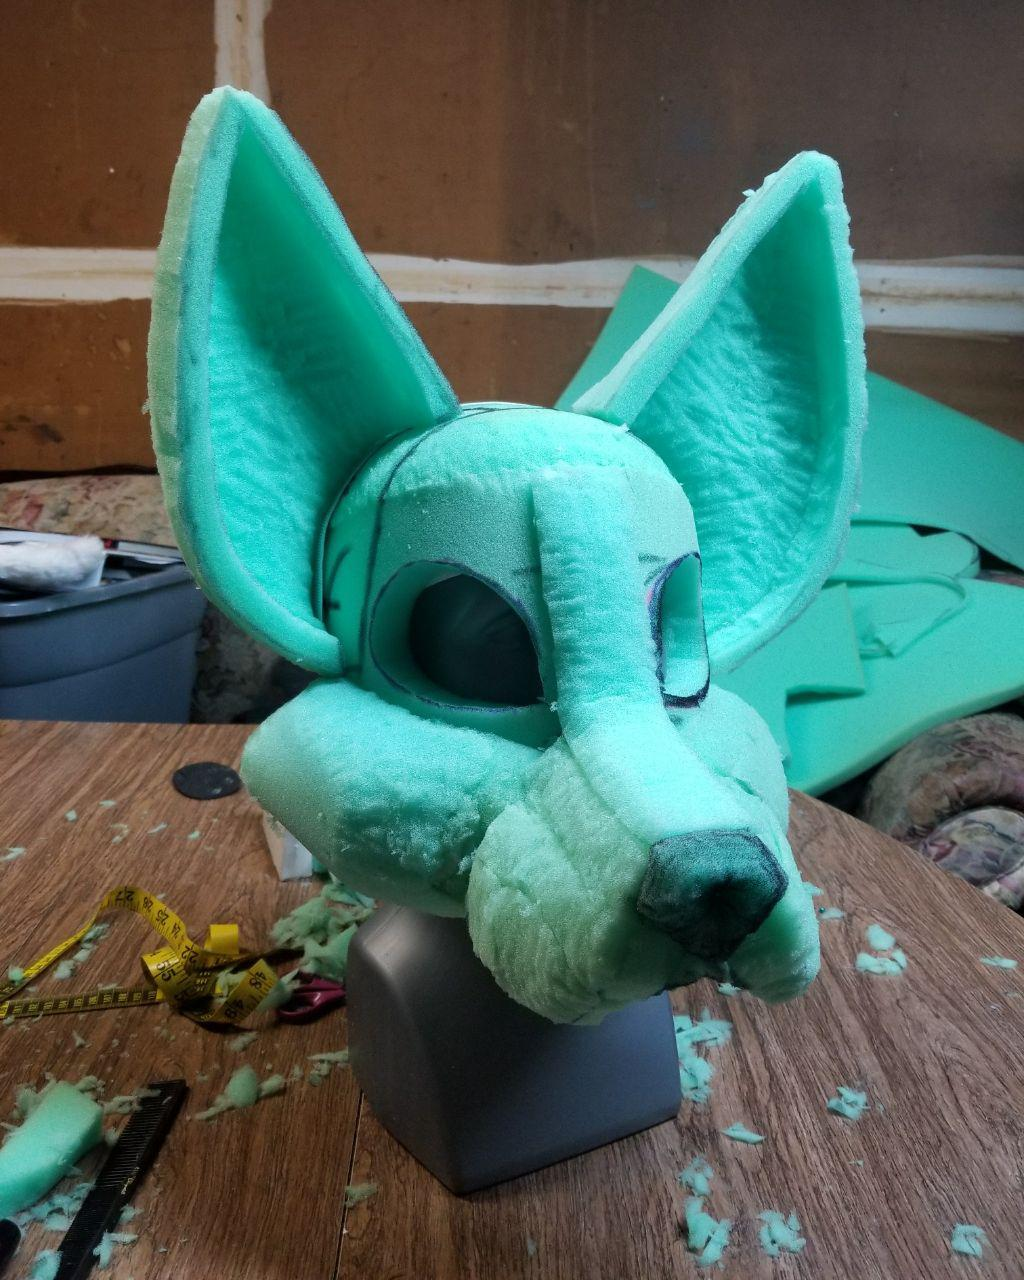 Most recent image: Sculpting Phosphor